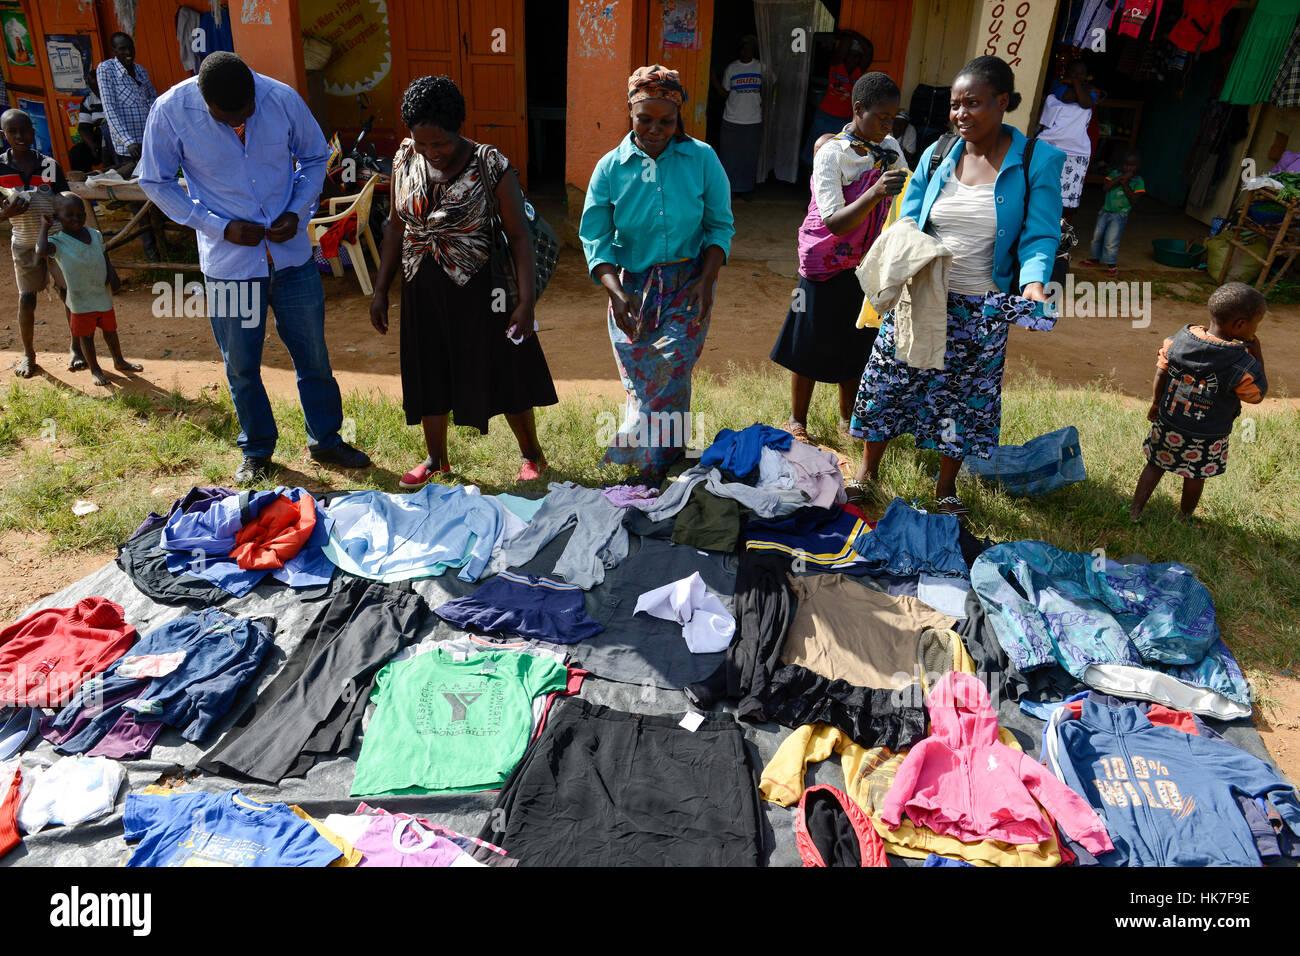 kenia kisumu county kaimosi stra enh ndler verkaufen gebrauchte kleidung aus europa kenia. Black Bedroom Furniture Sets. Home Design Ideas